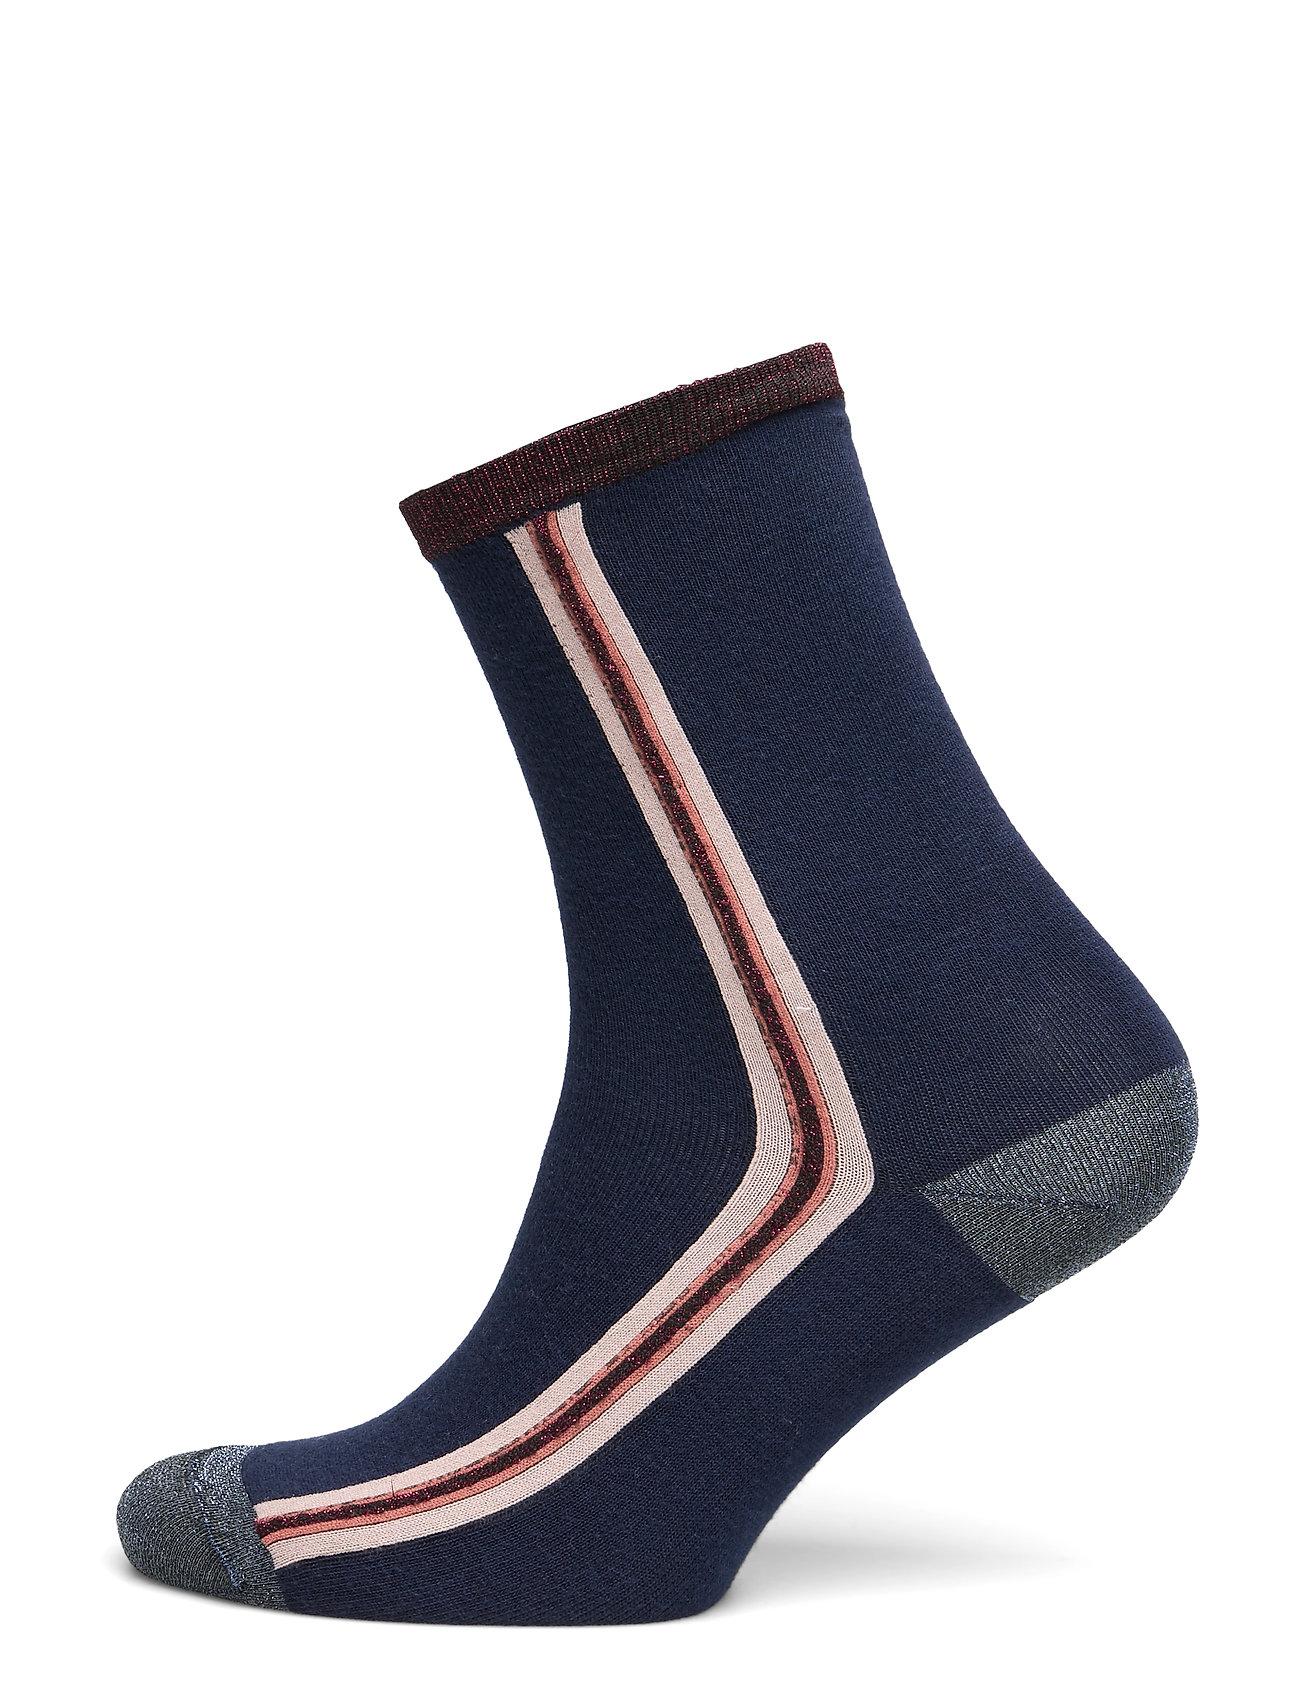 UNMADE Copenhagen Elinor sock - NAVY BLUE